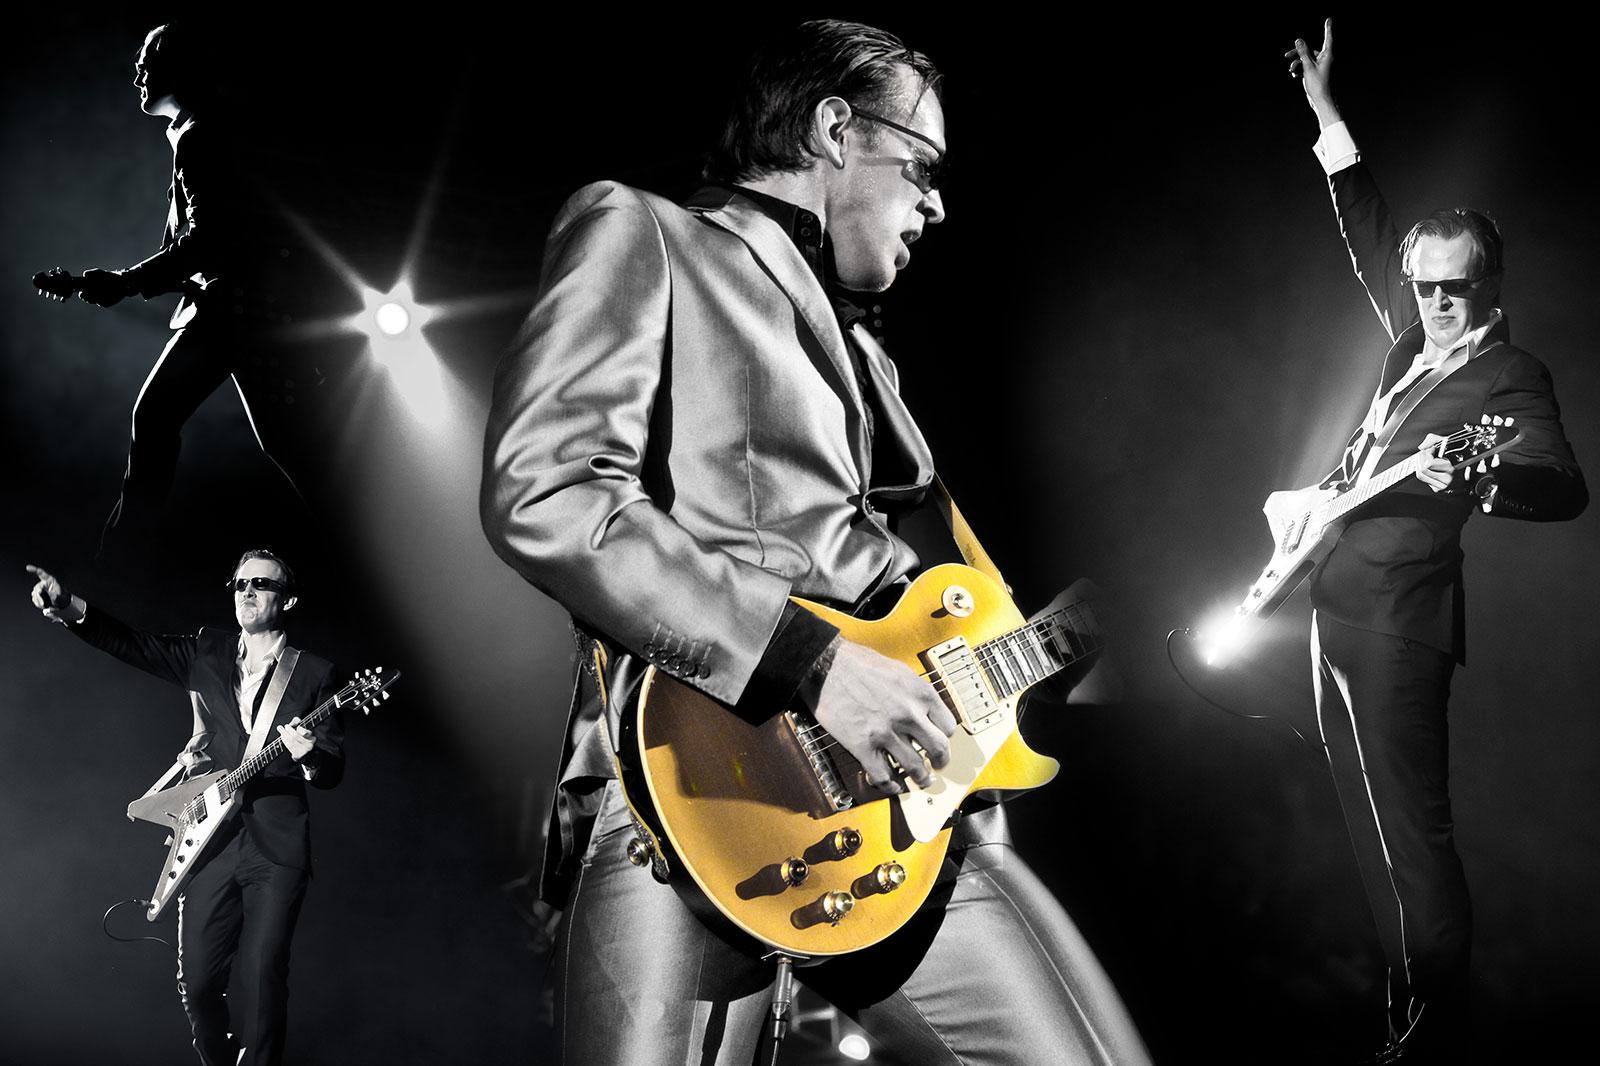 Gratis Album von Gitarren und Blues Legende Joe Bonamassa